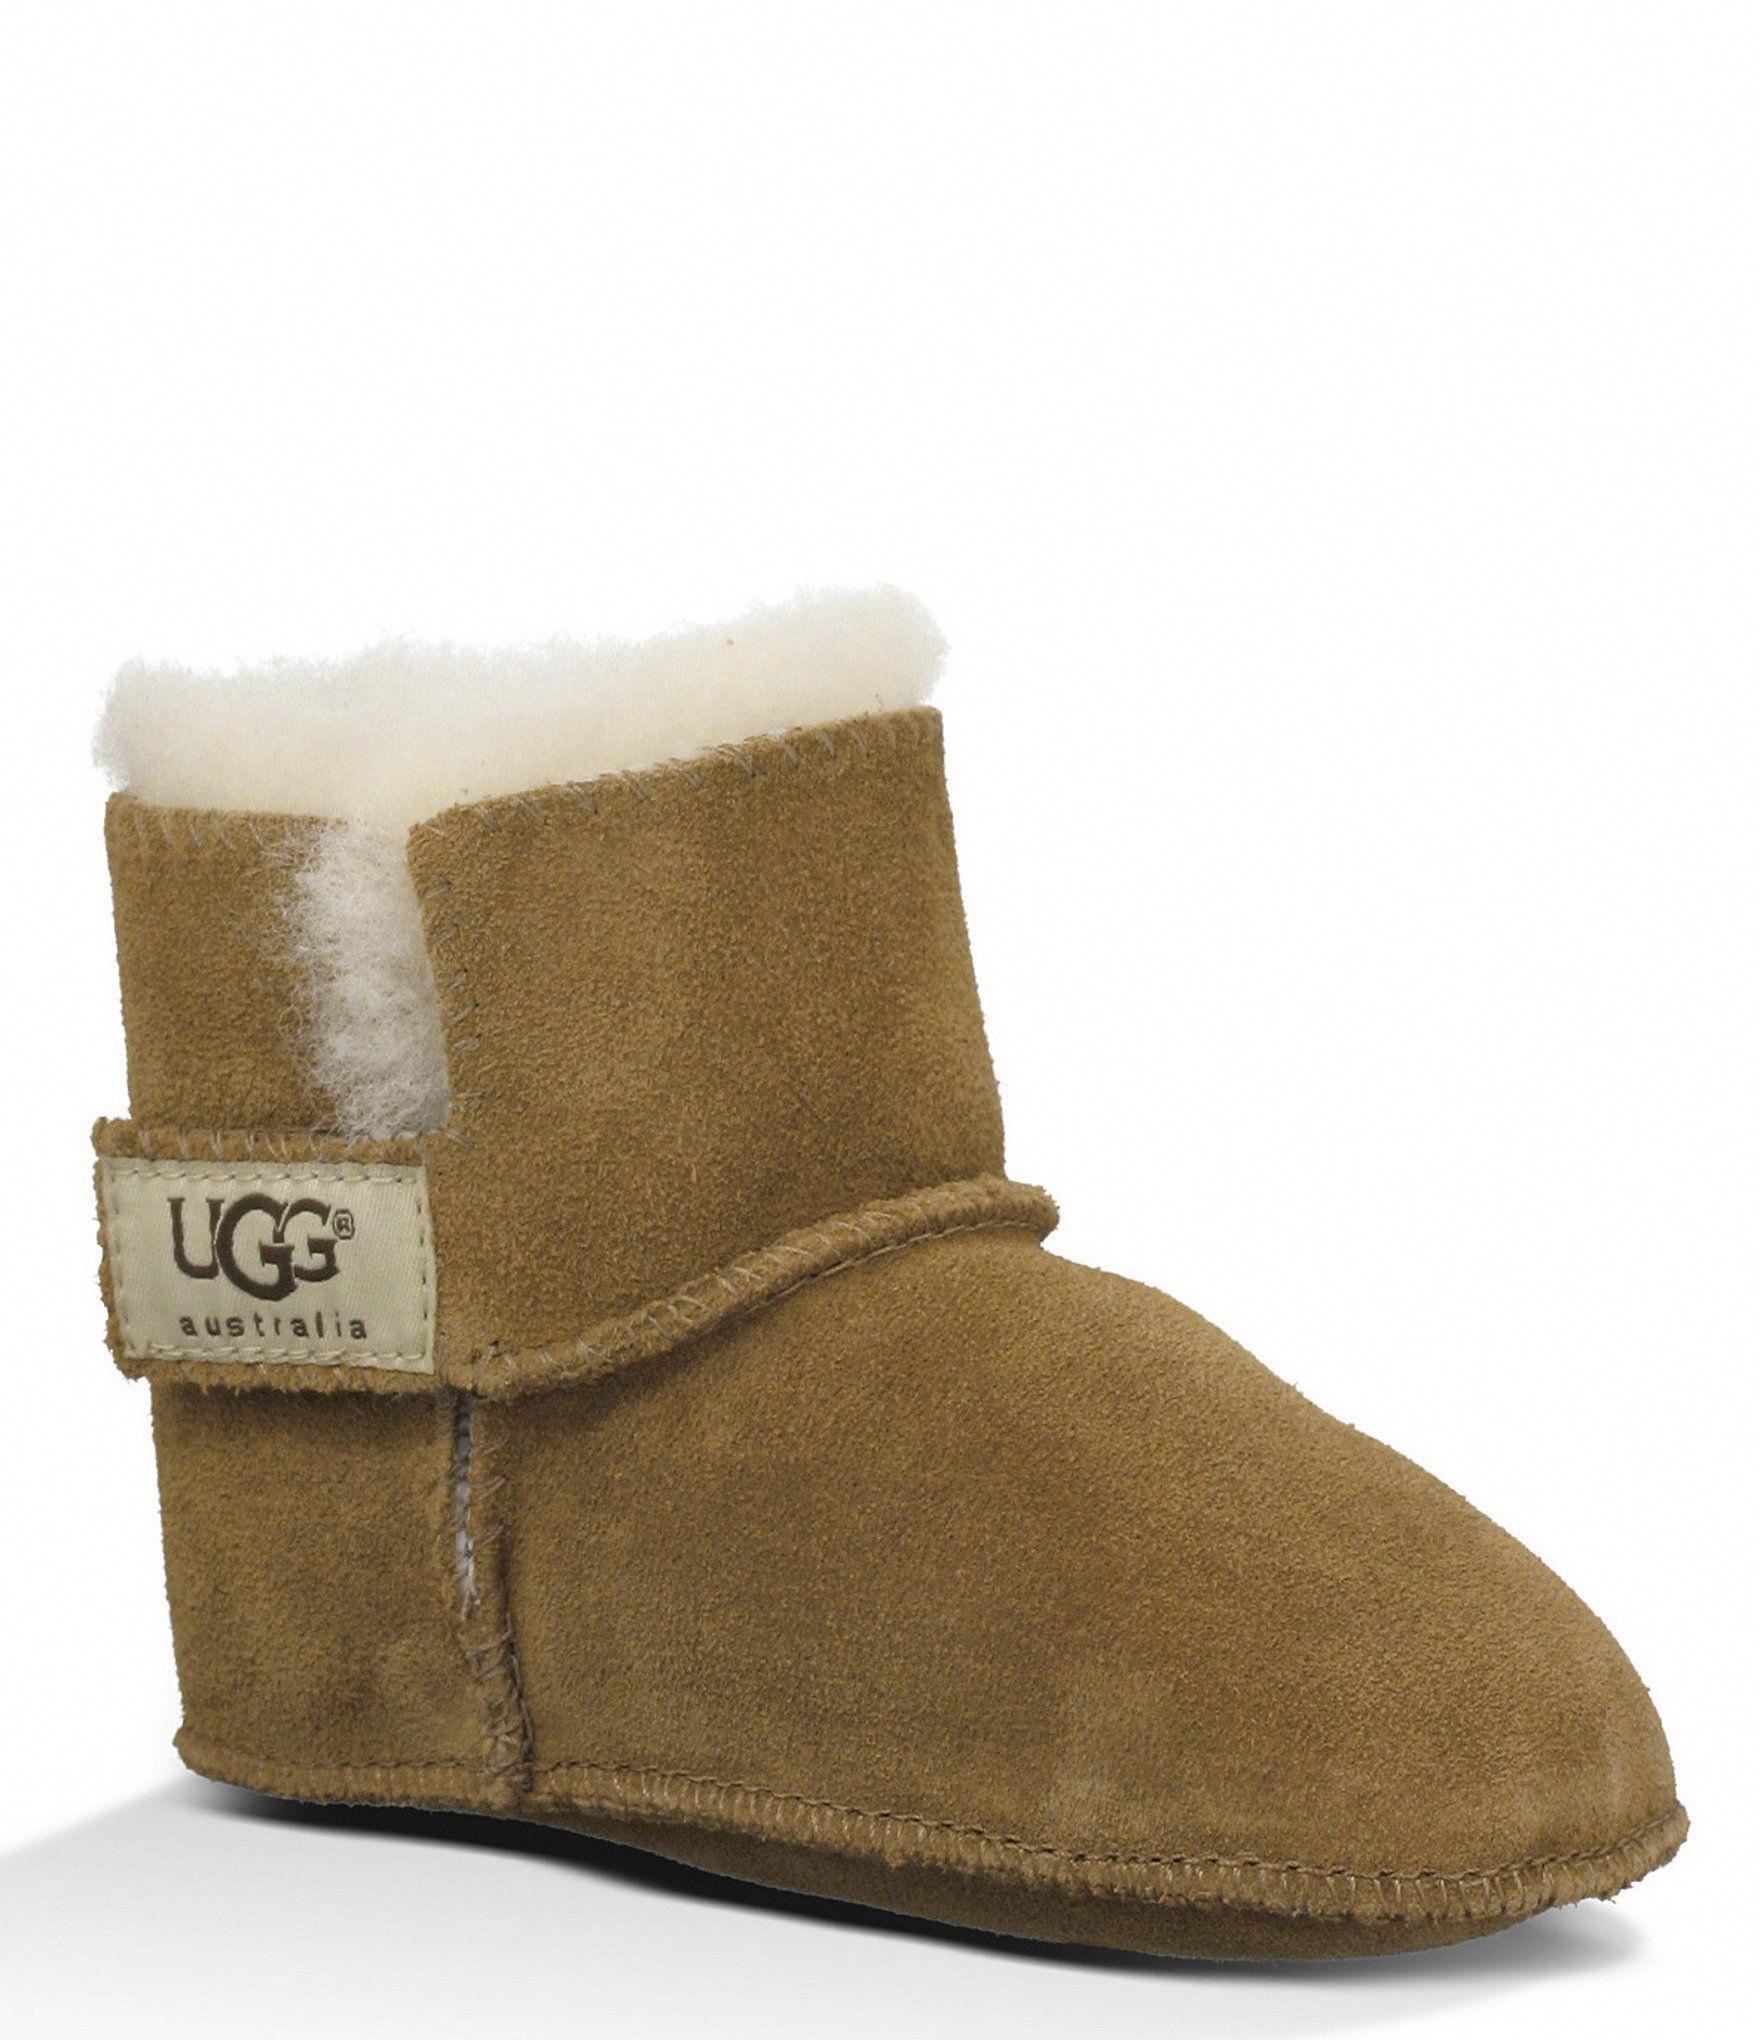 Uggs, Crib shoes girl, Sheepskin boots